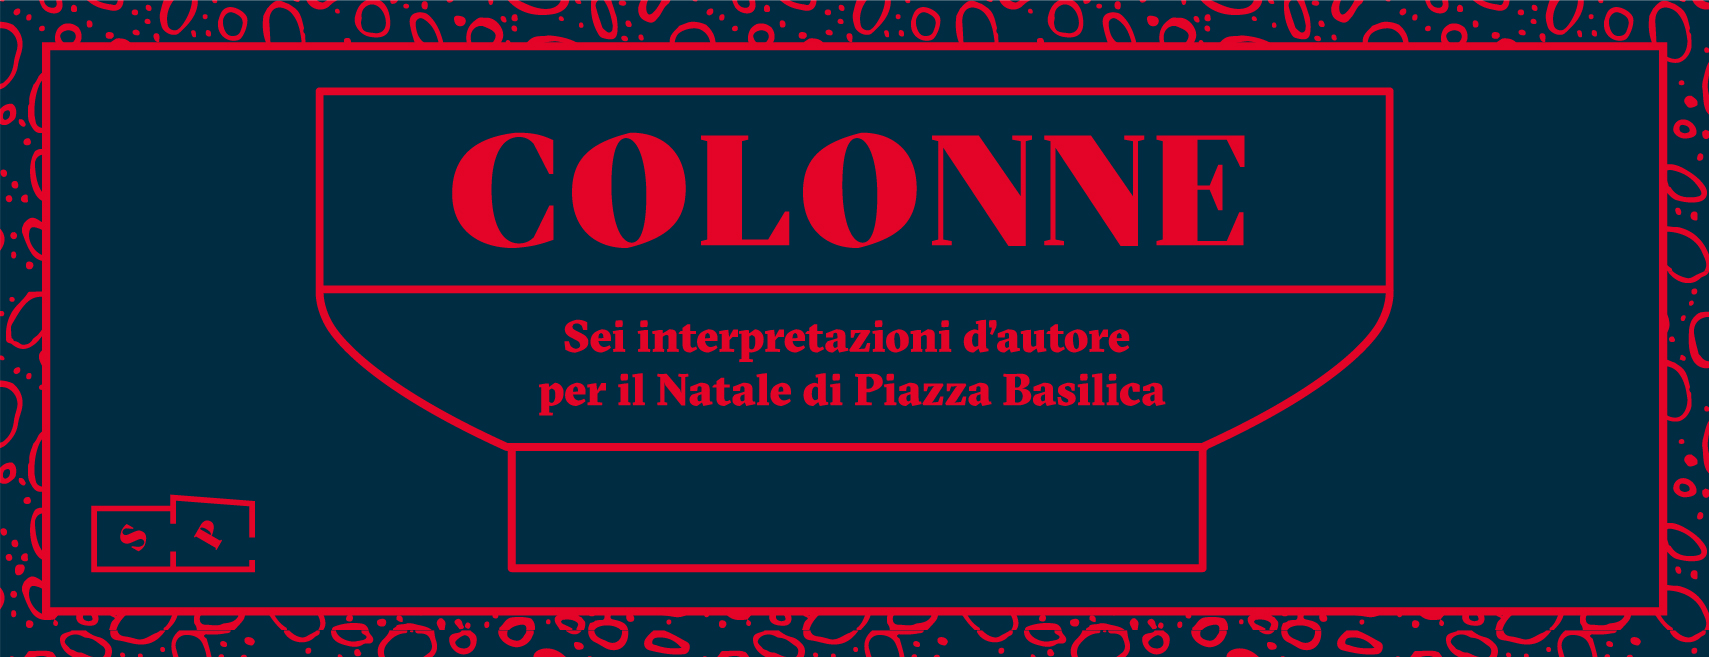 colonne_facebook-03.jpg